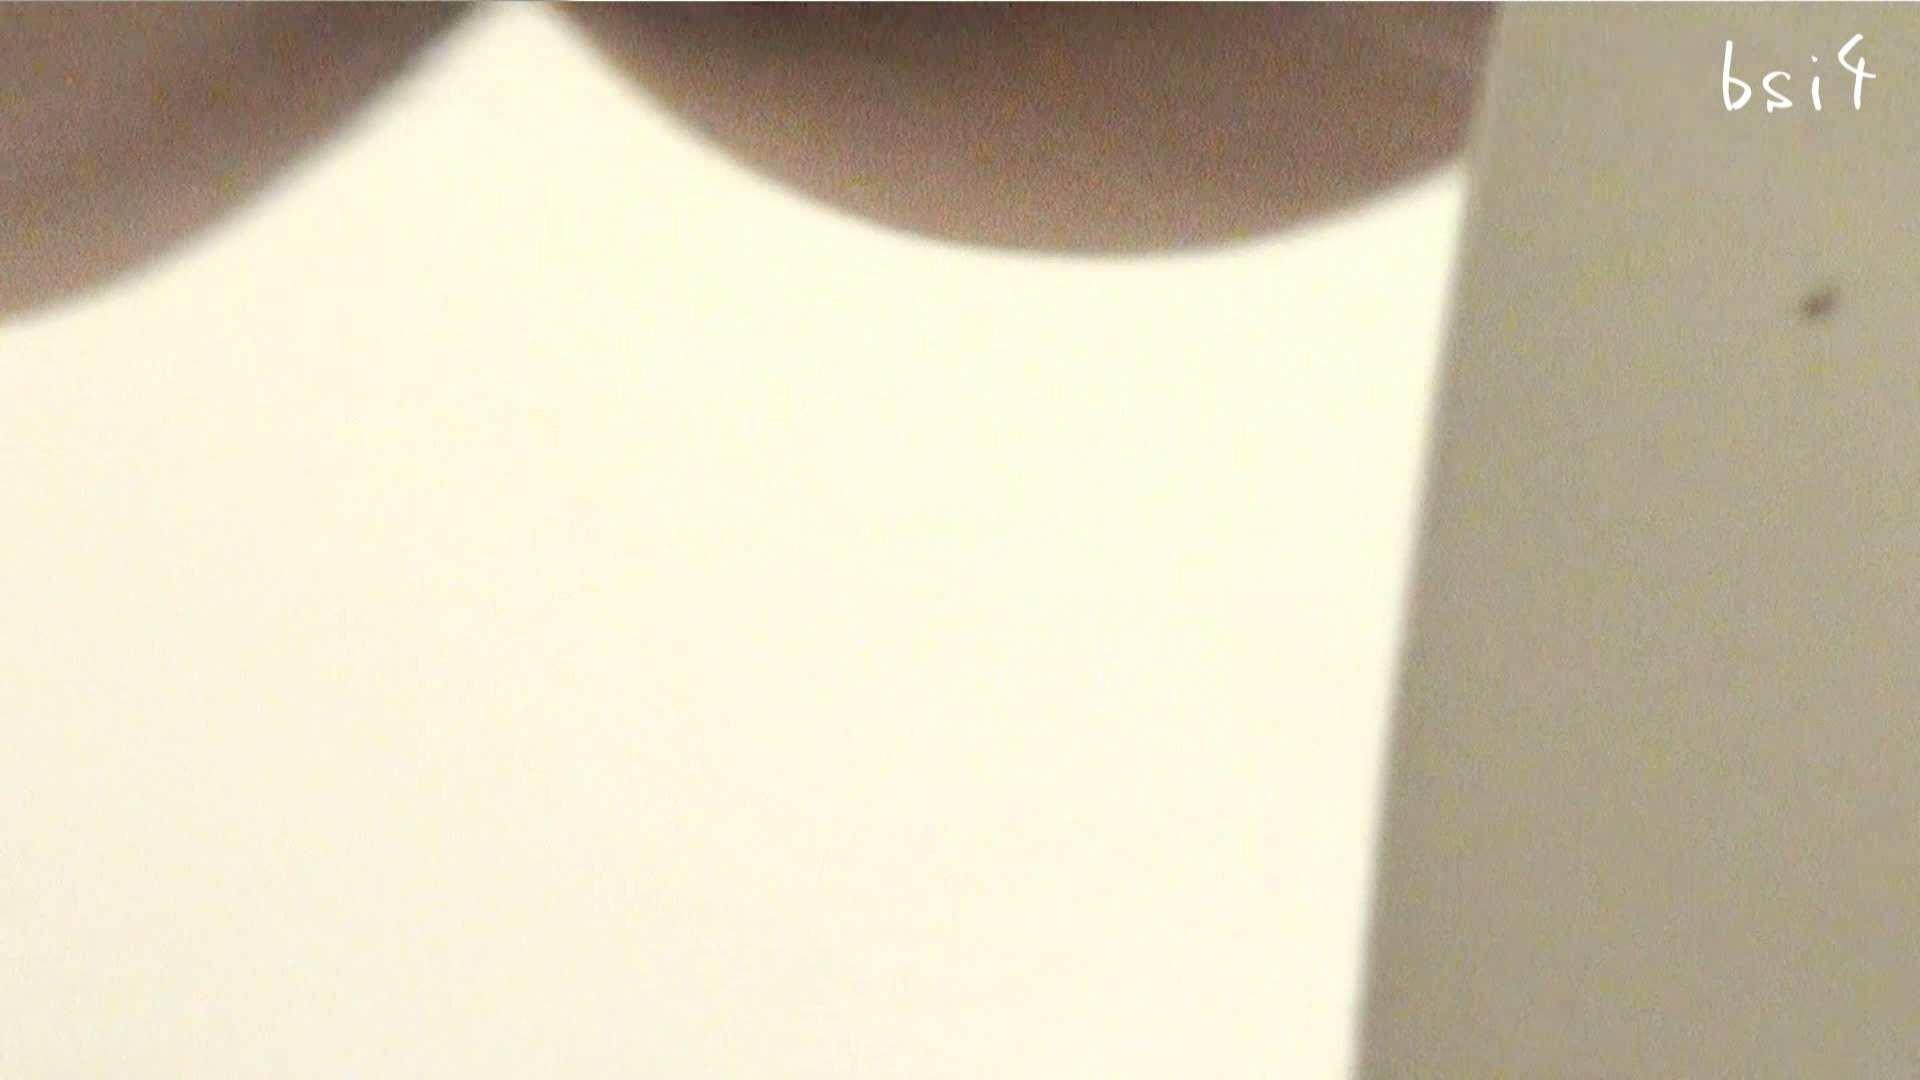 至高下半身盗撮-PREMIUM-【院内病棟編 】VOL4 OLの実態   盗撮  86pic 19